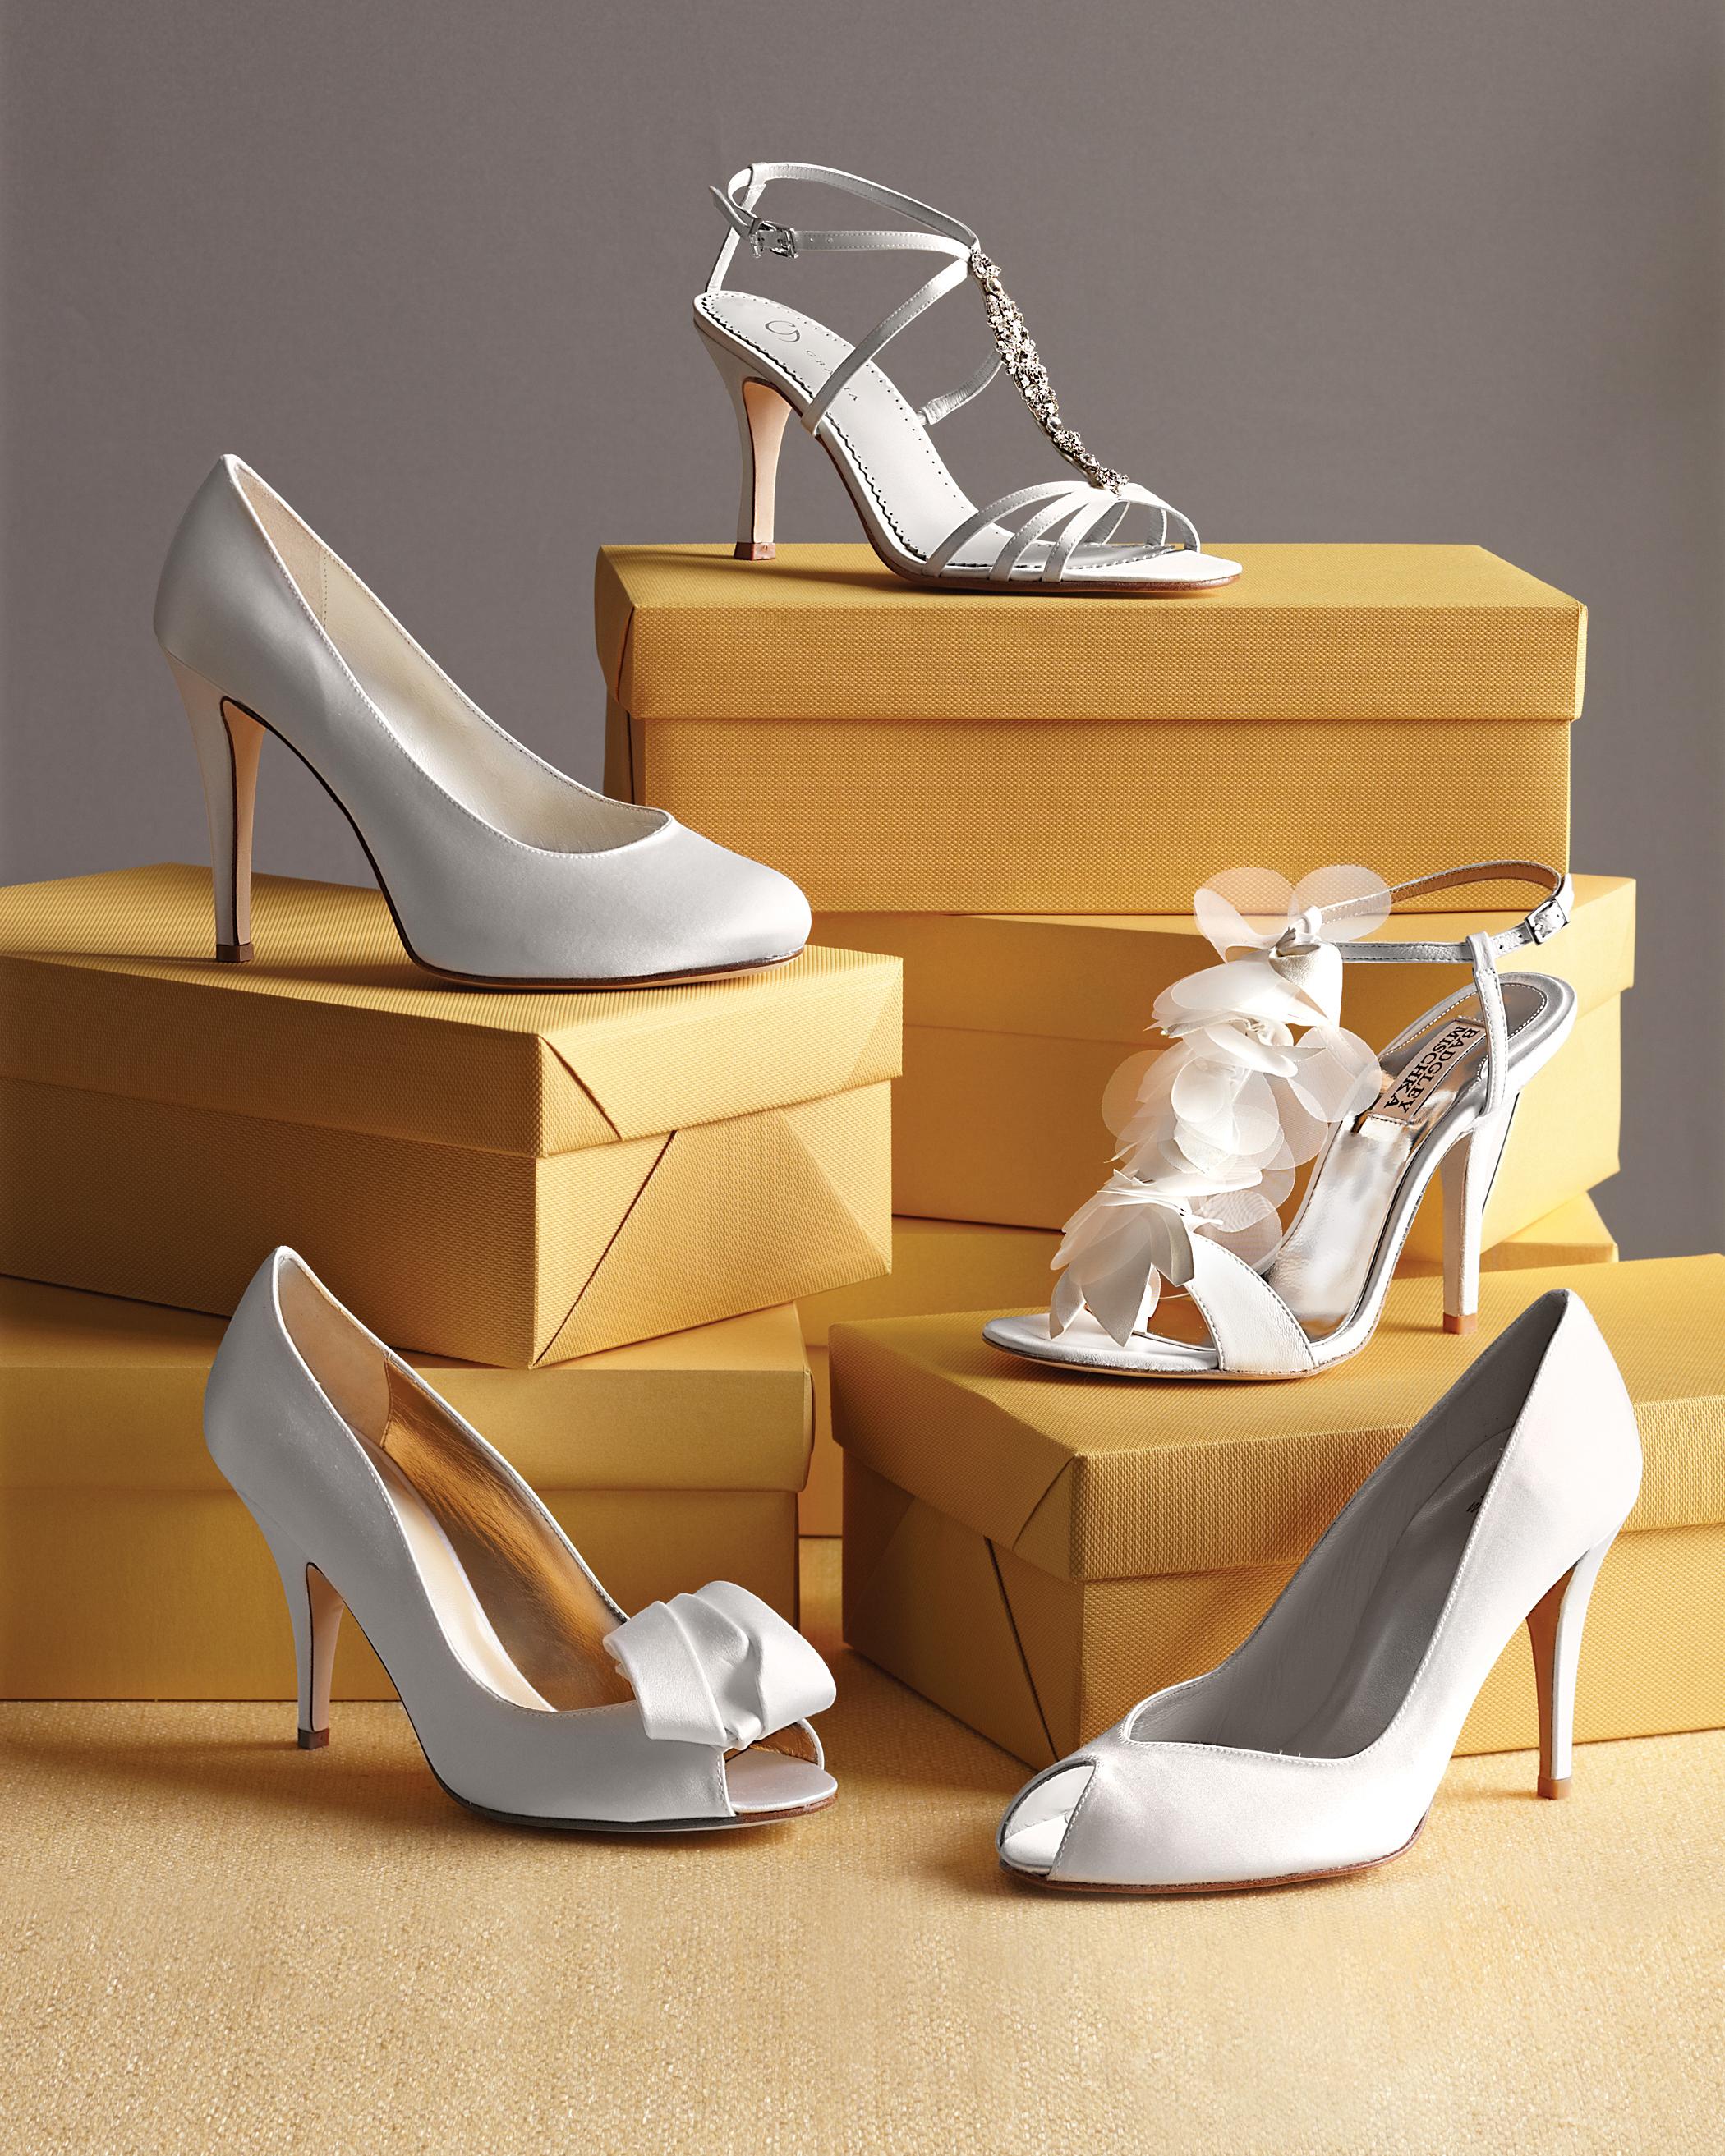 shoes-0811mwd107435.jpg